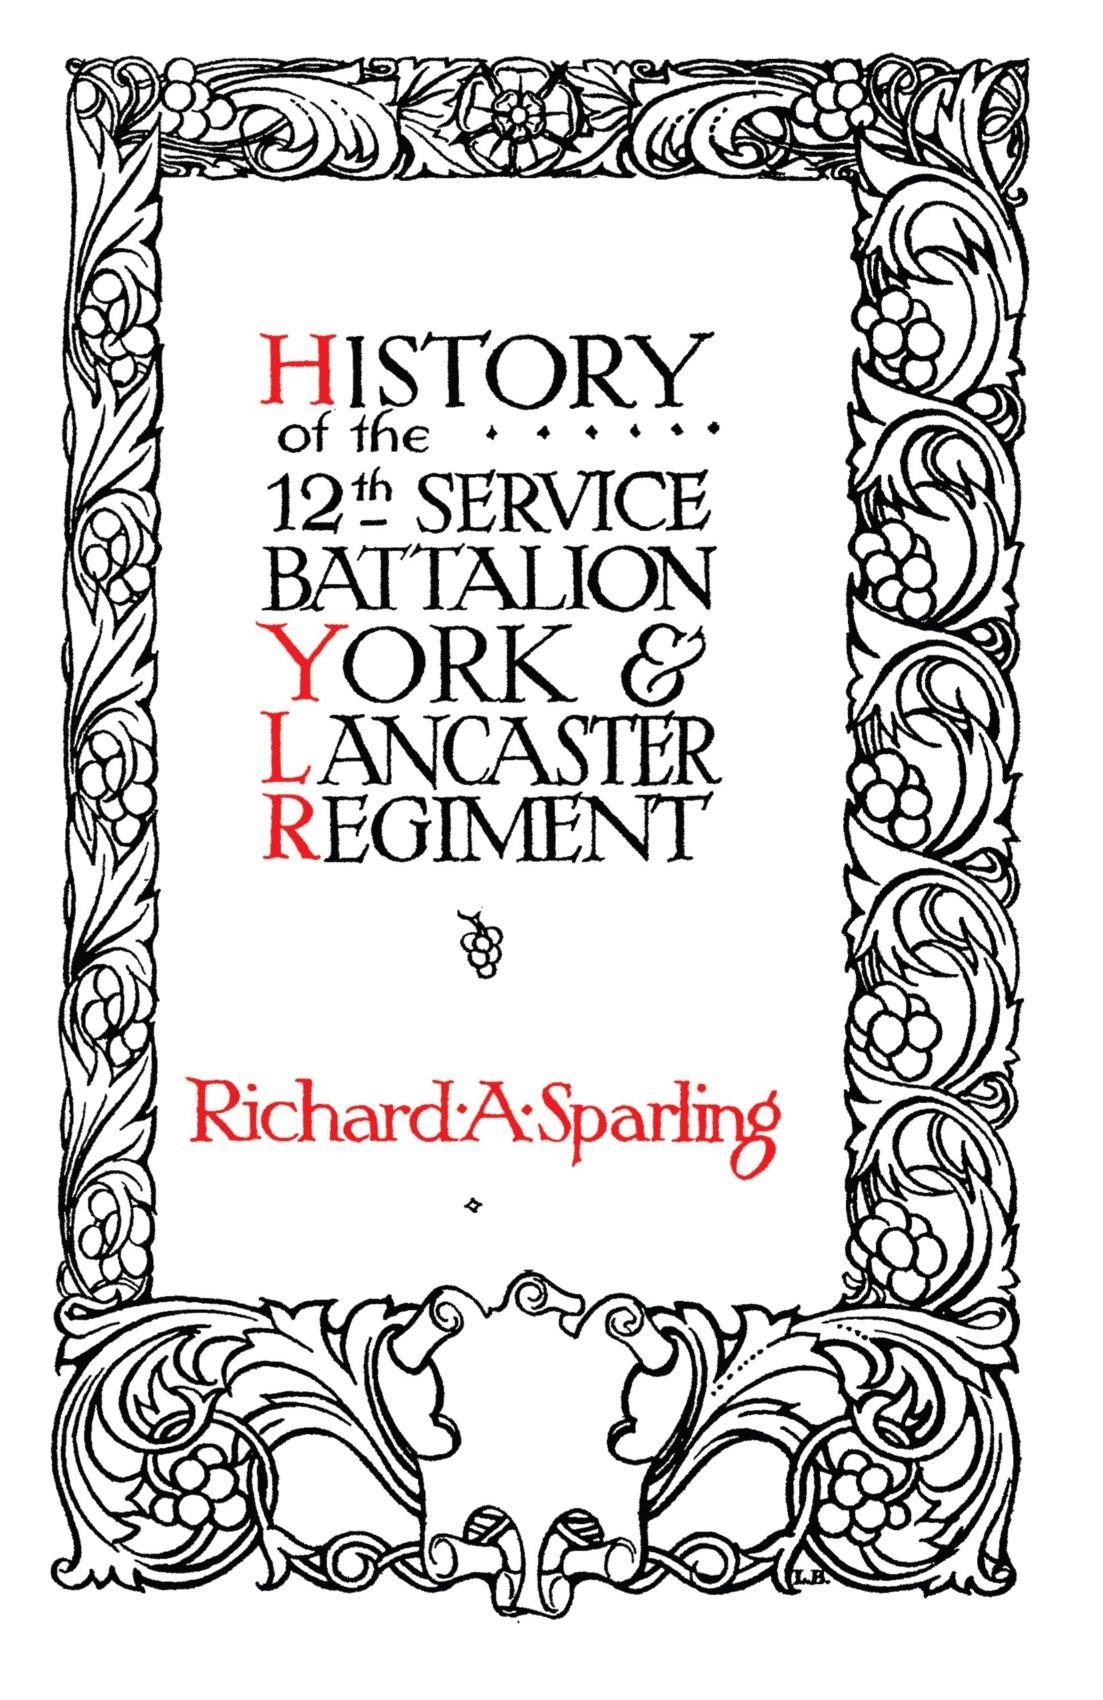 History of the 12th Service Battalion York & Lancaster Regiment ebook